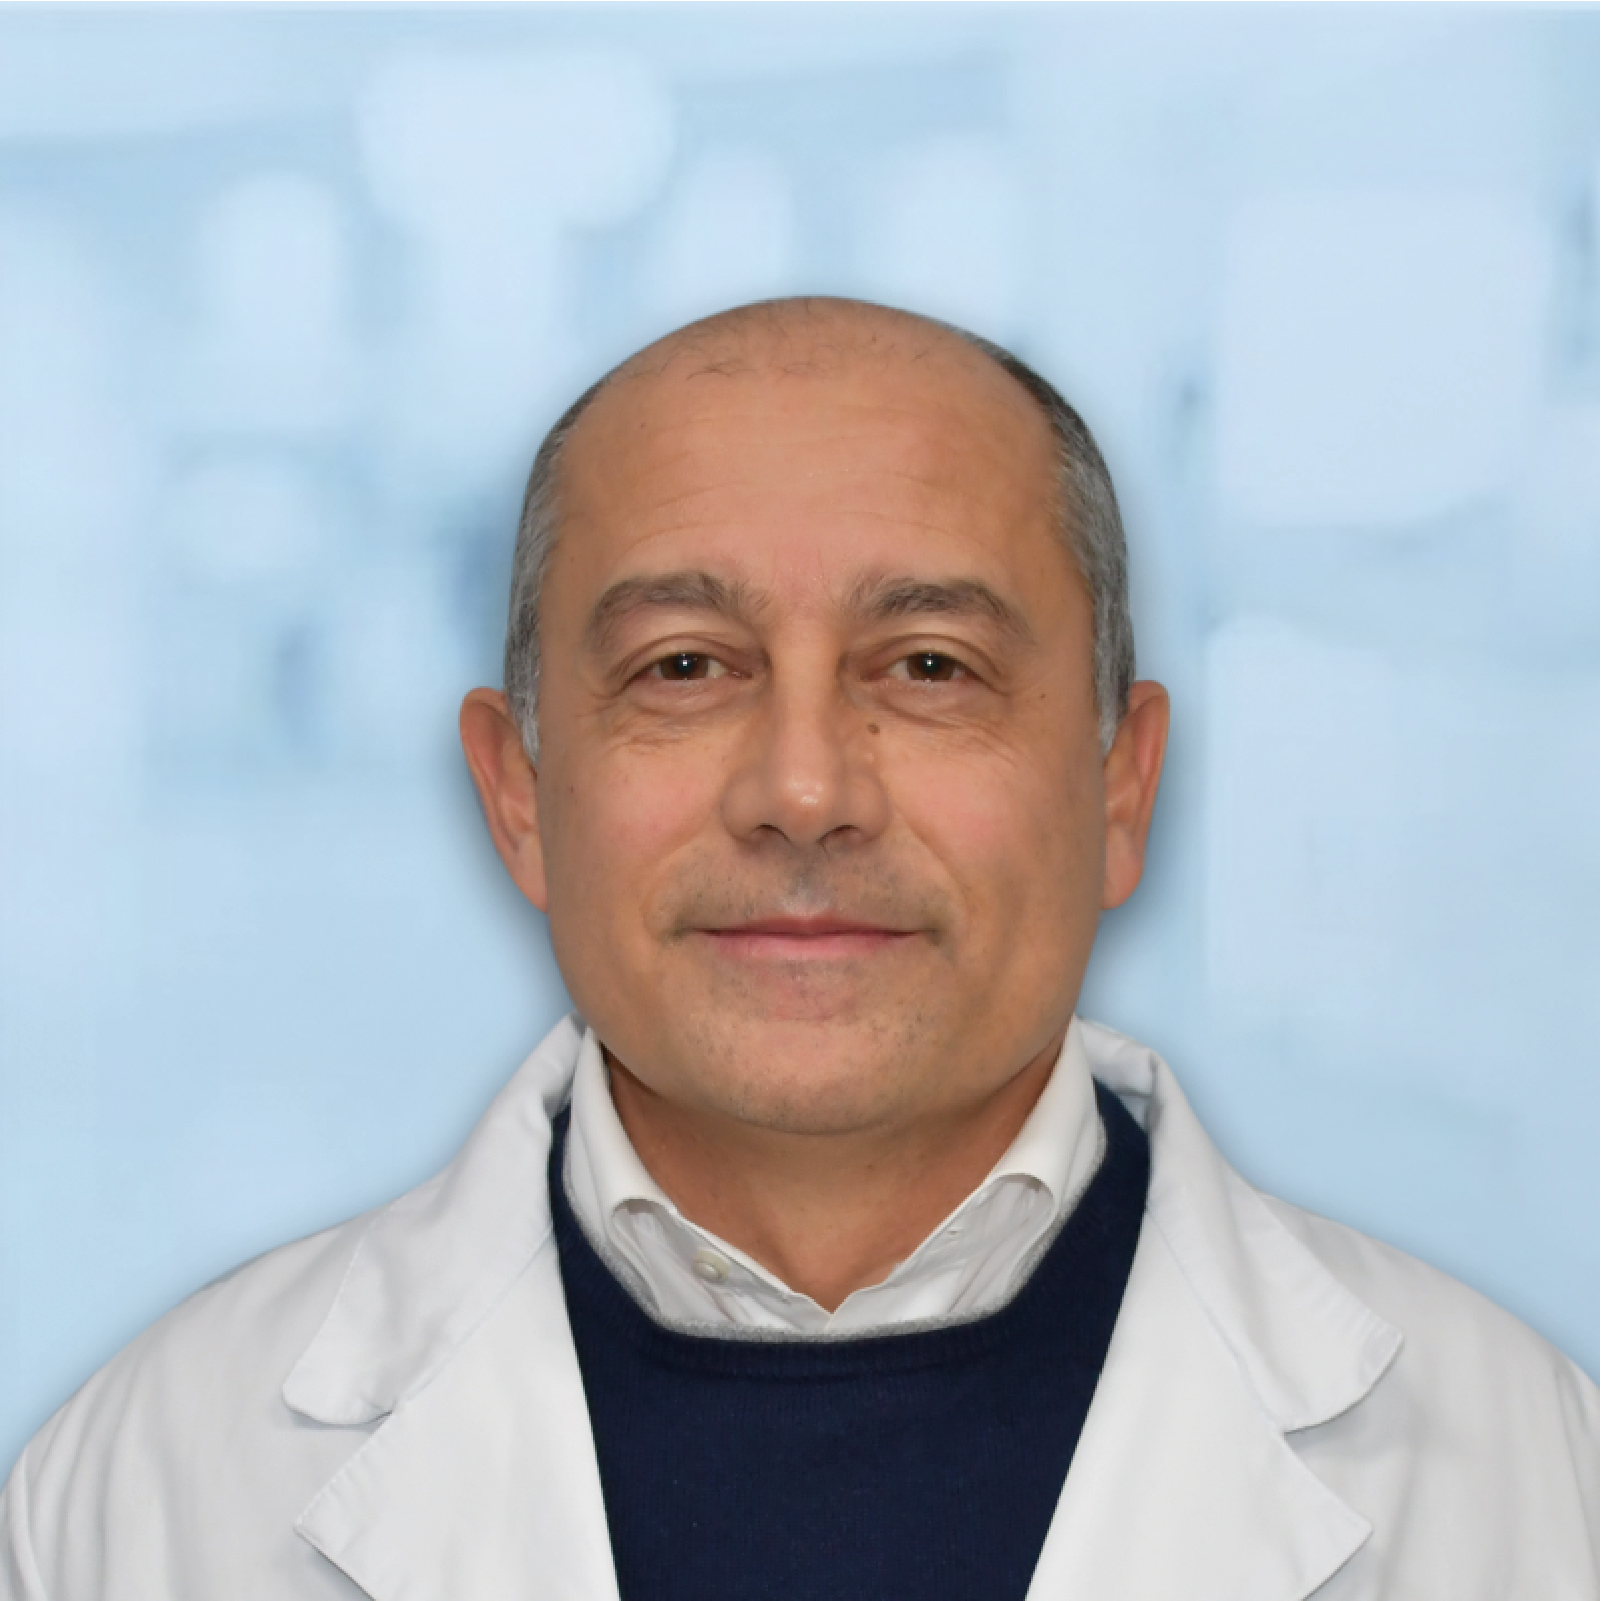 Dr. Adolfo Pepe